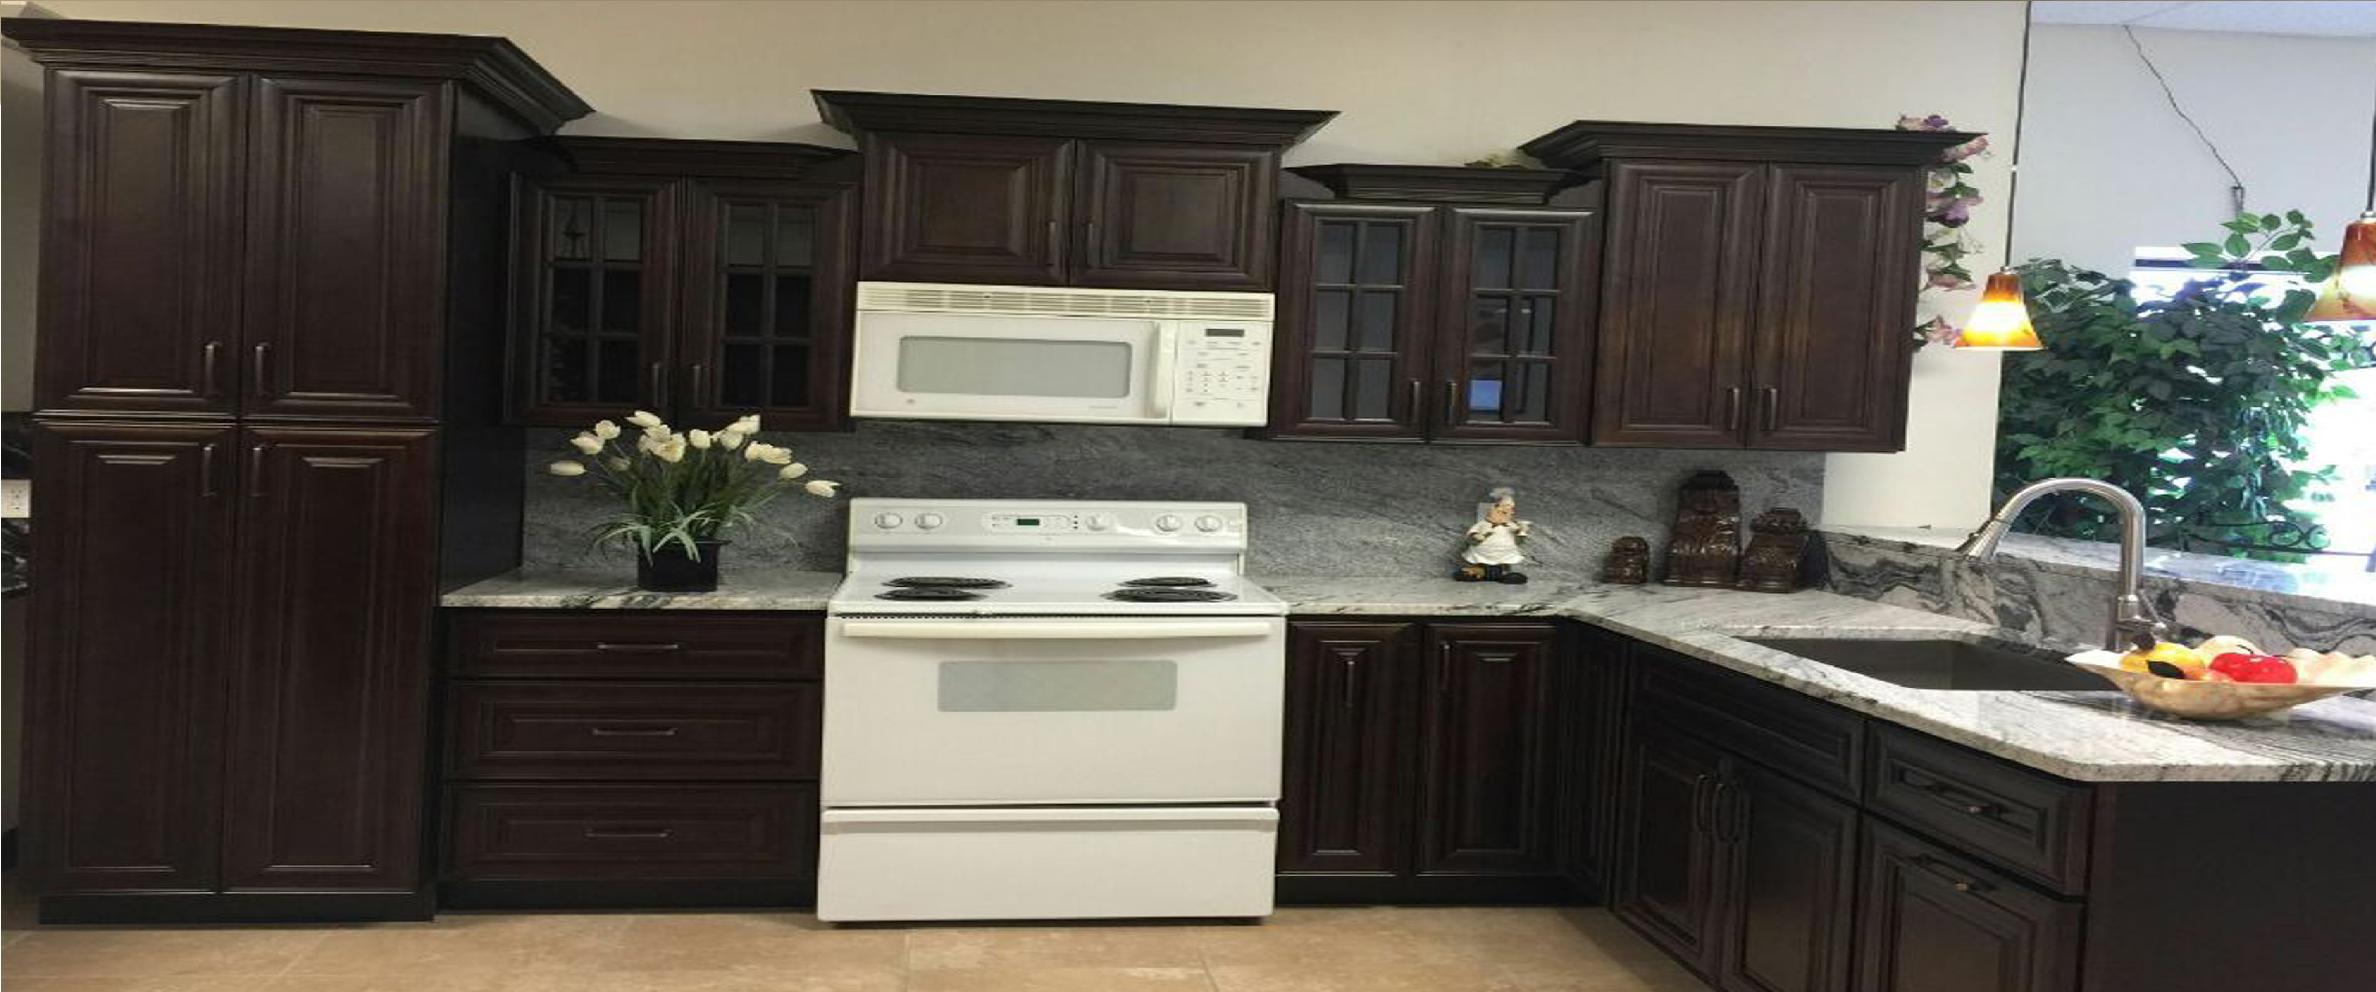 a1cng kitchen remodeling lincoln ne Espresso Maple